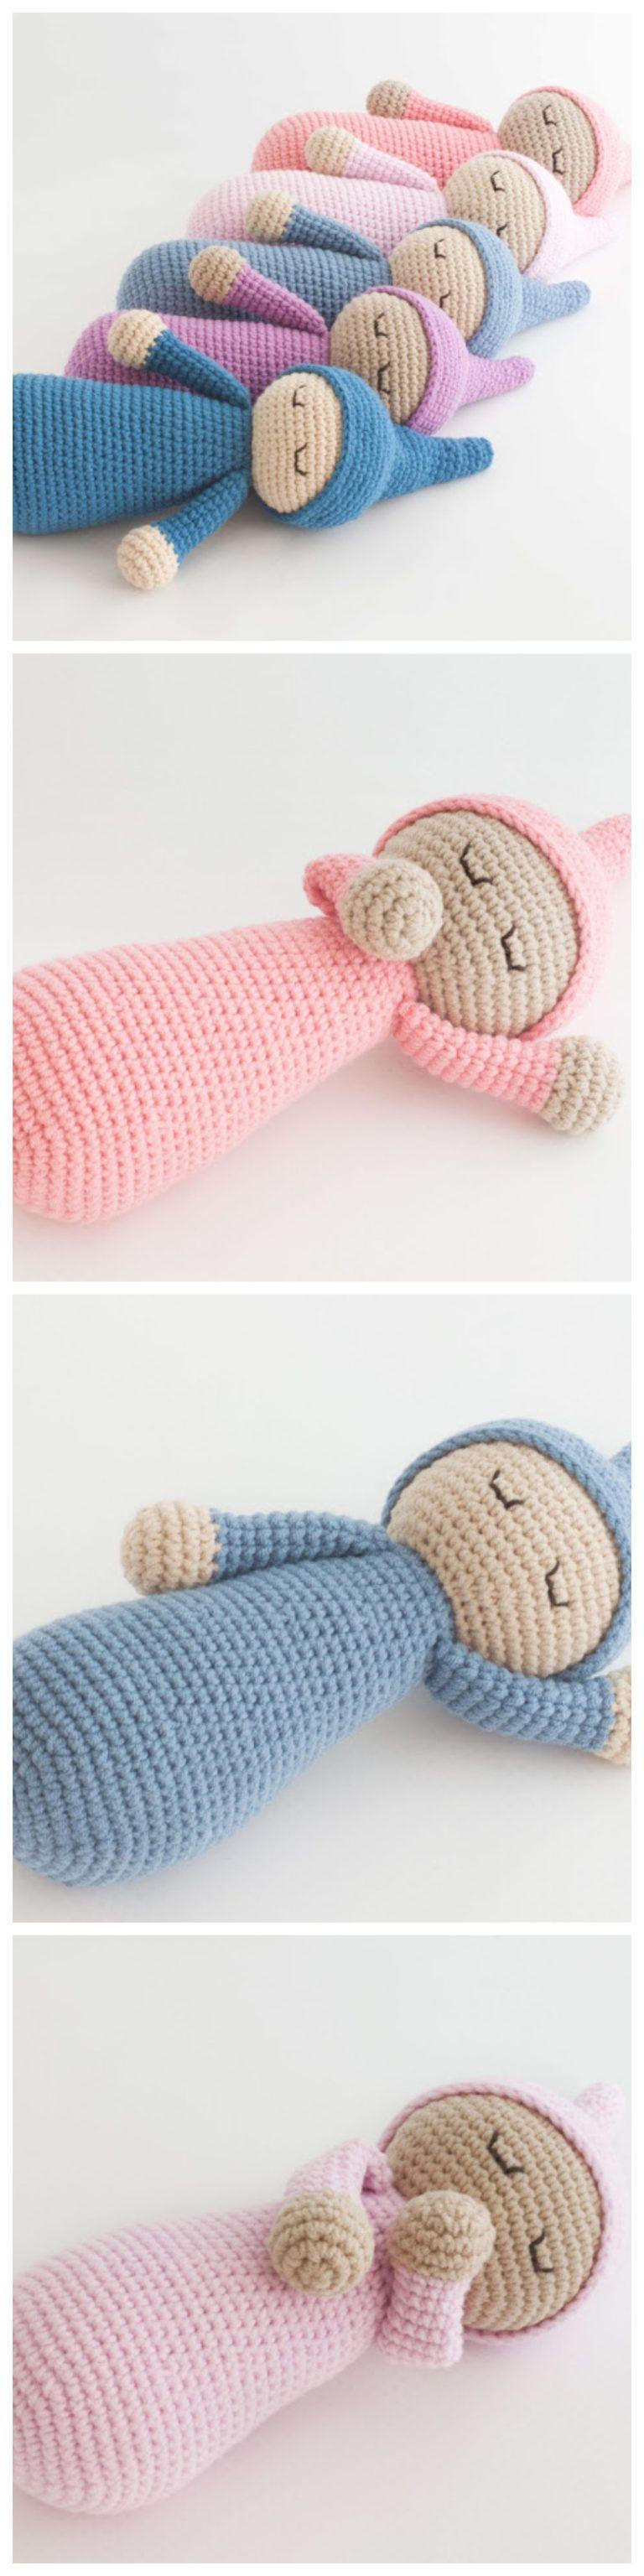 Crochet Sleepyhead Doll – Free Pattern #babydoll